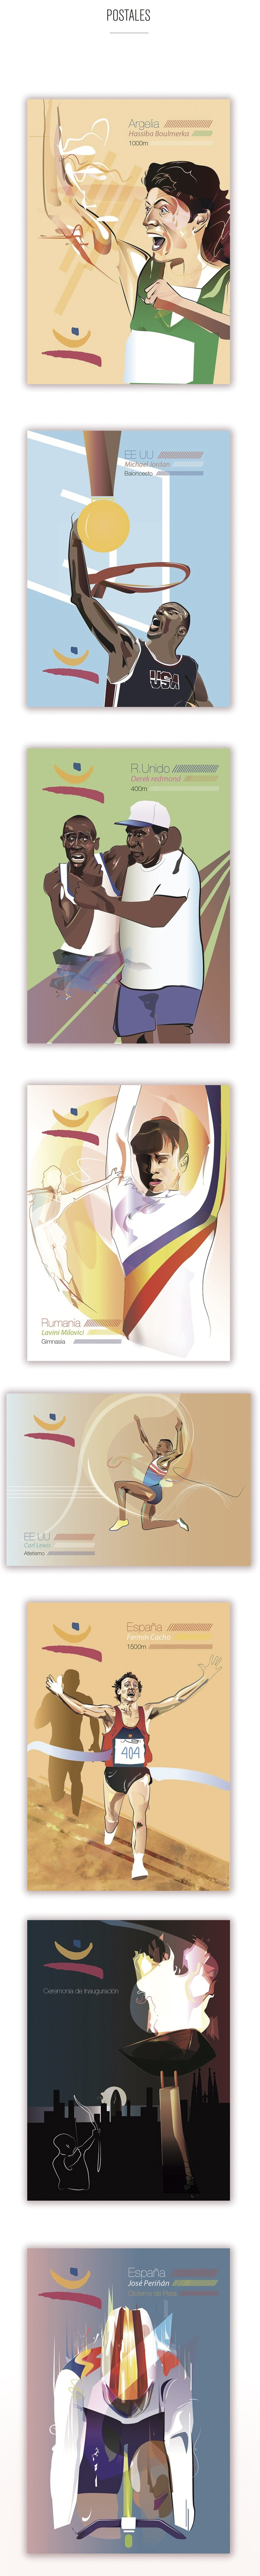 Postales Ilustradas - 20 aniversario de los JJOO Barcelona 92 1